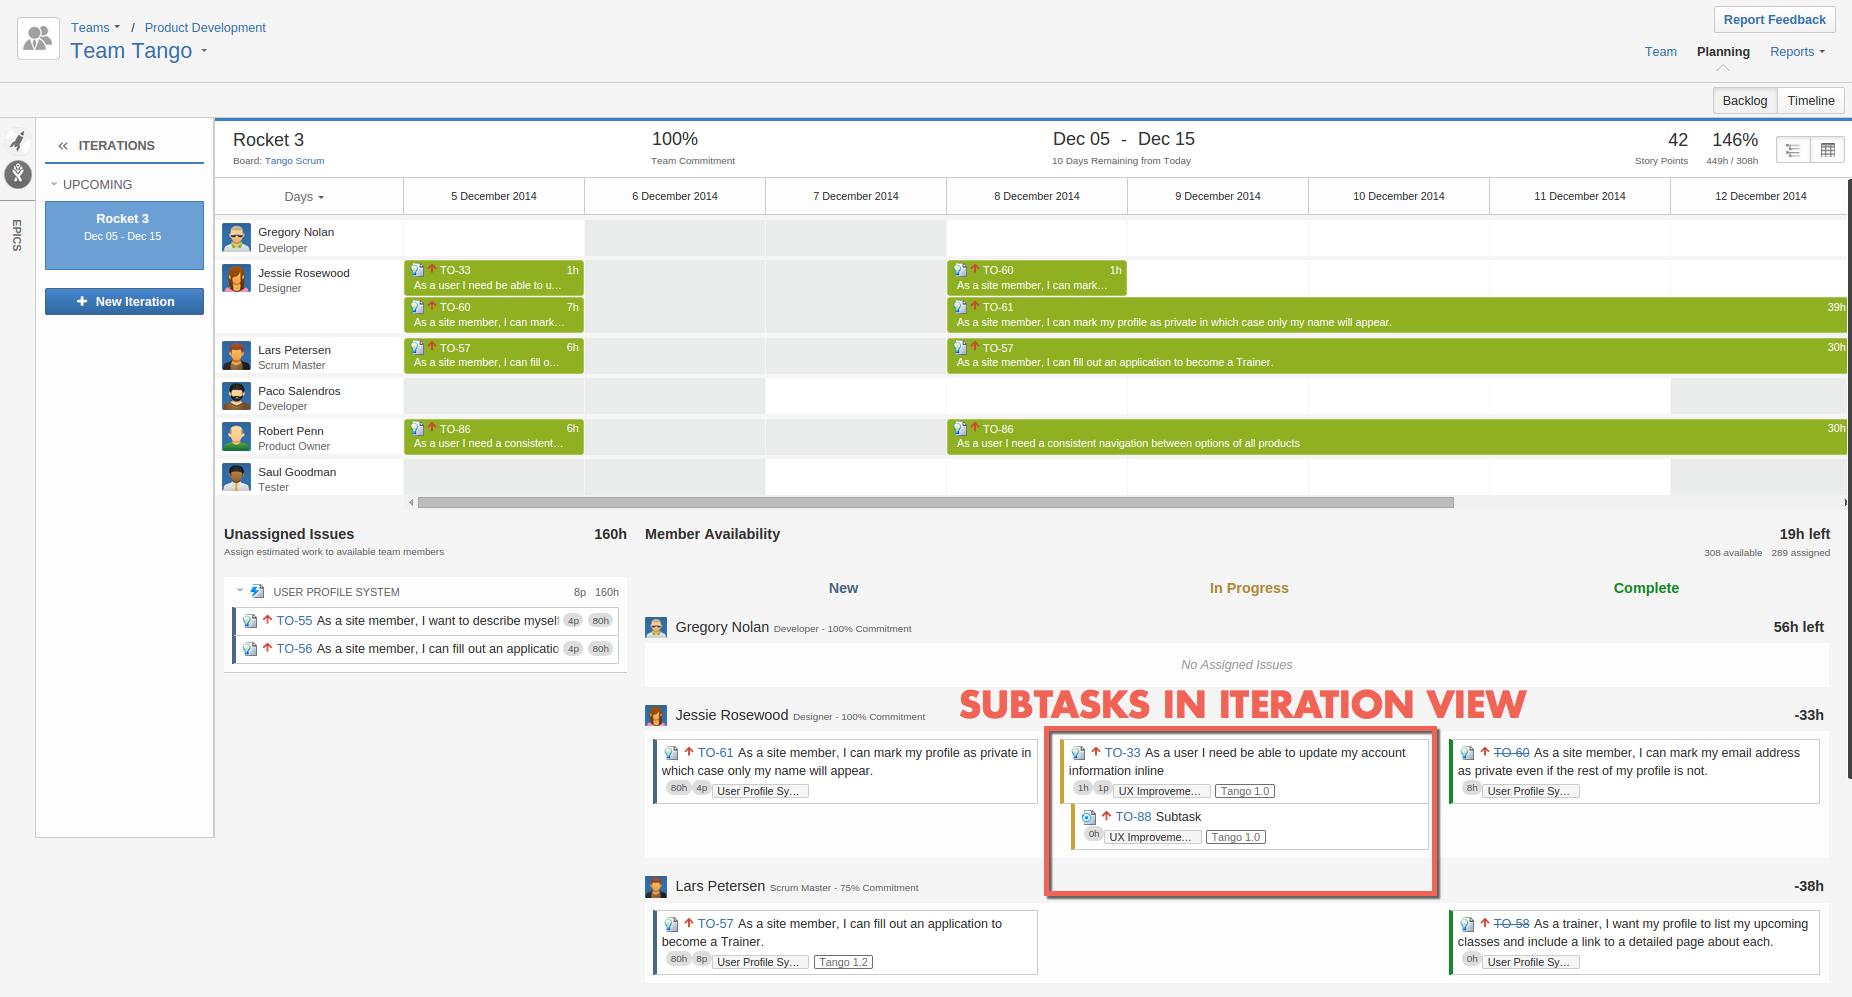 IterationTimeline_subtasks